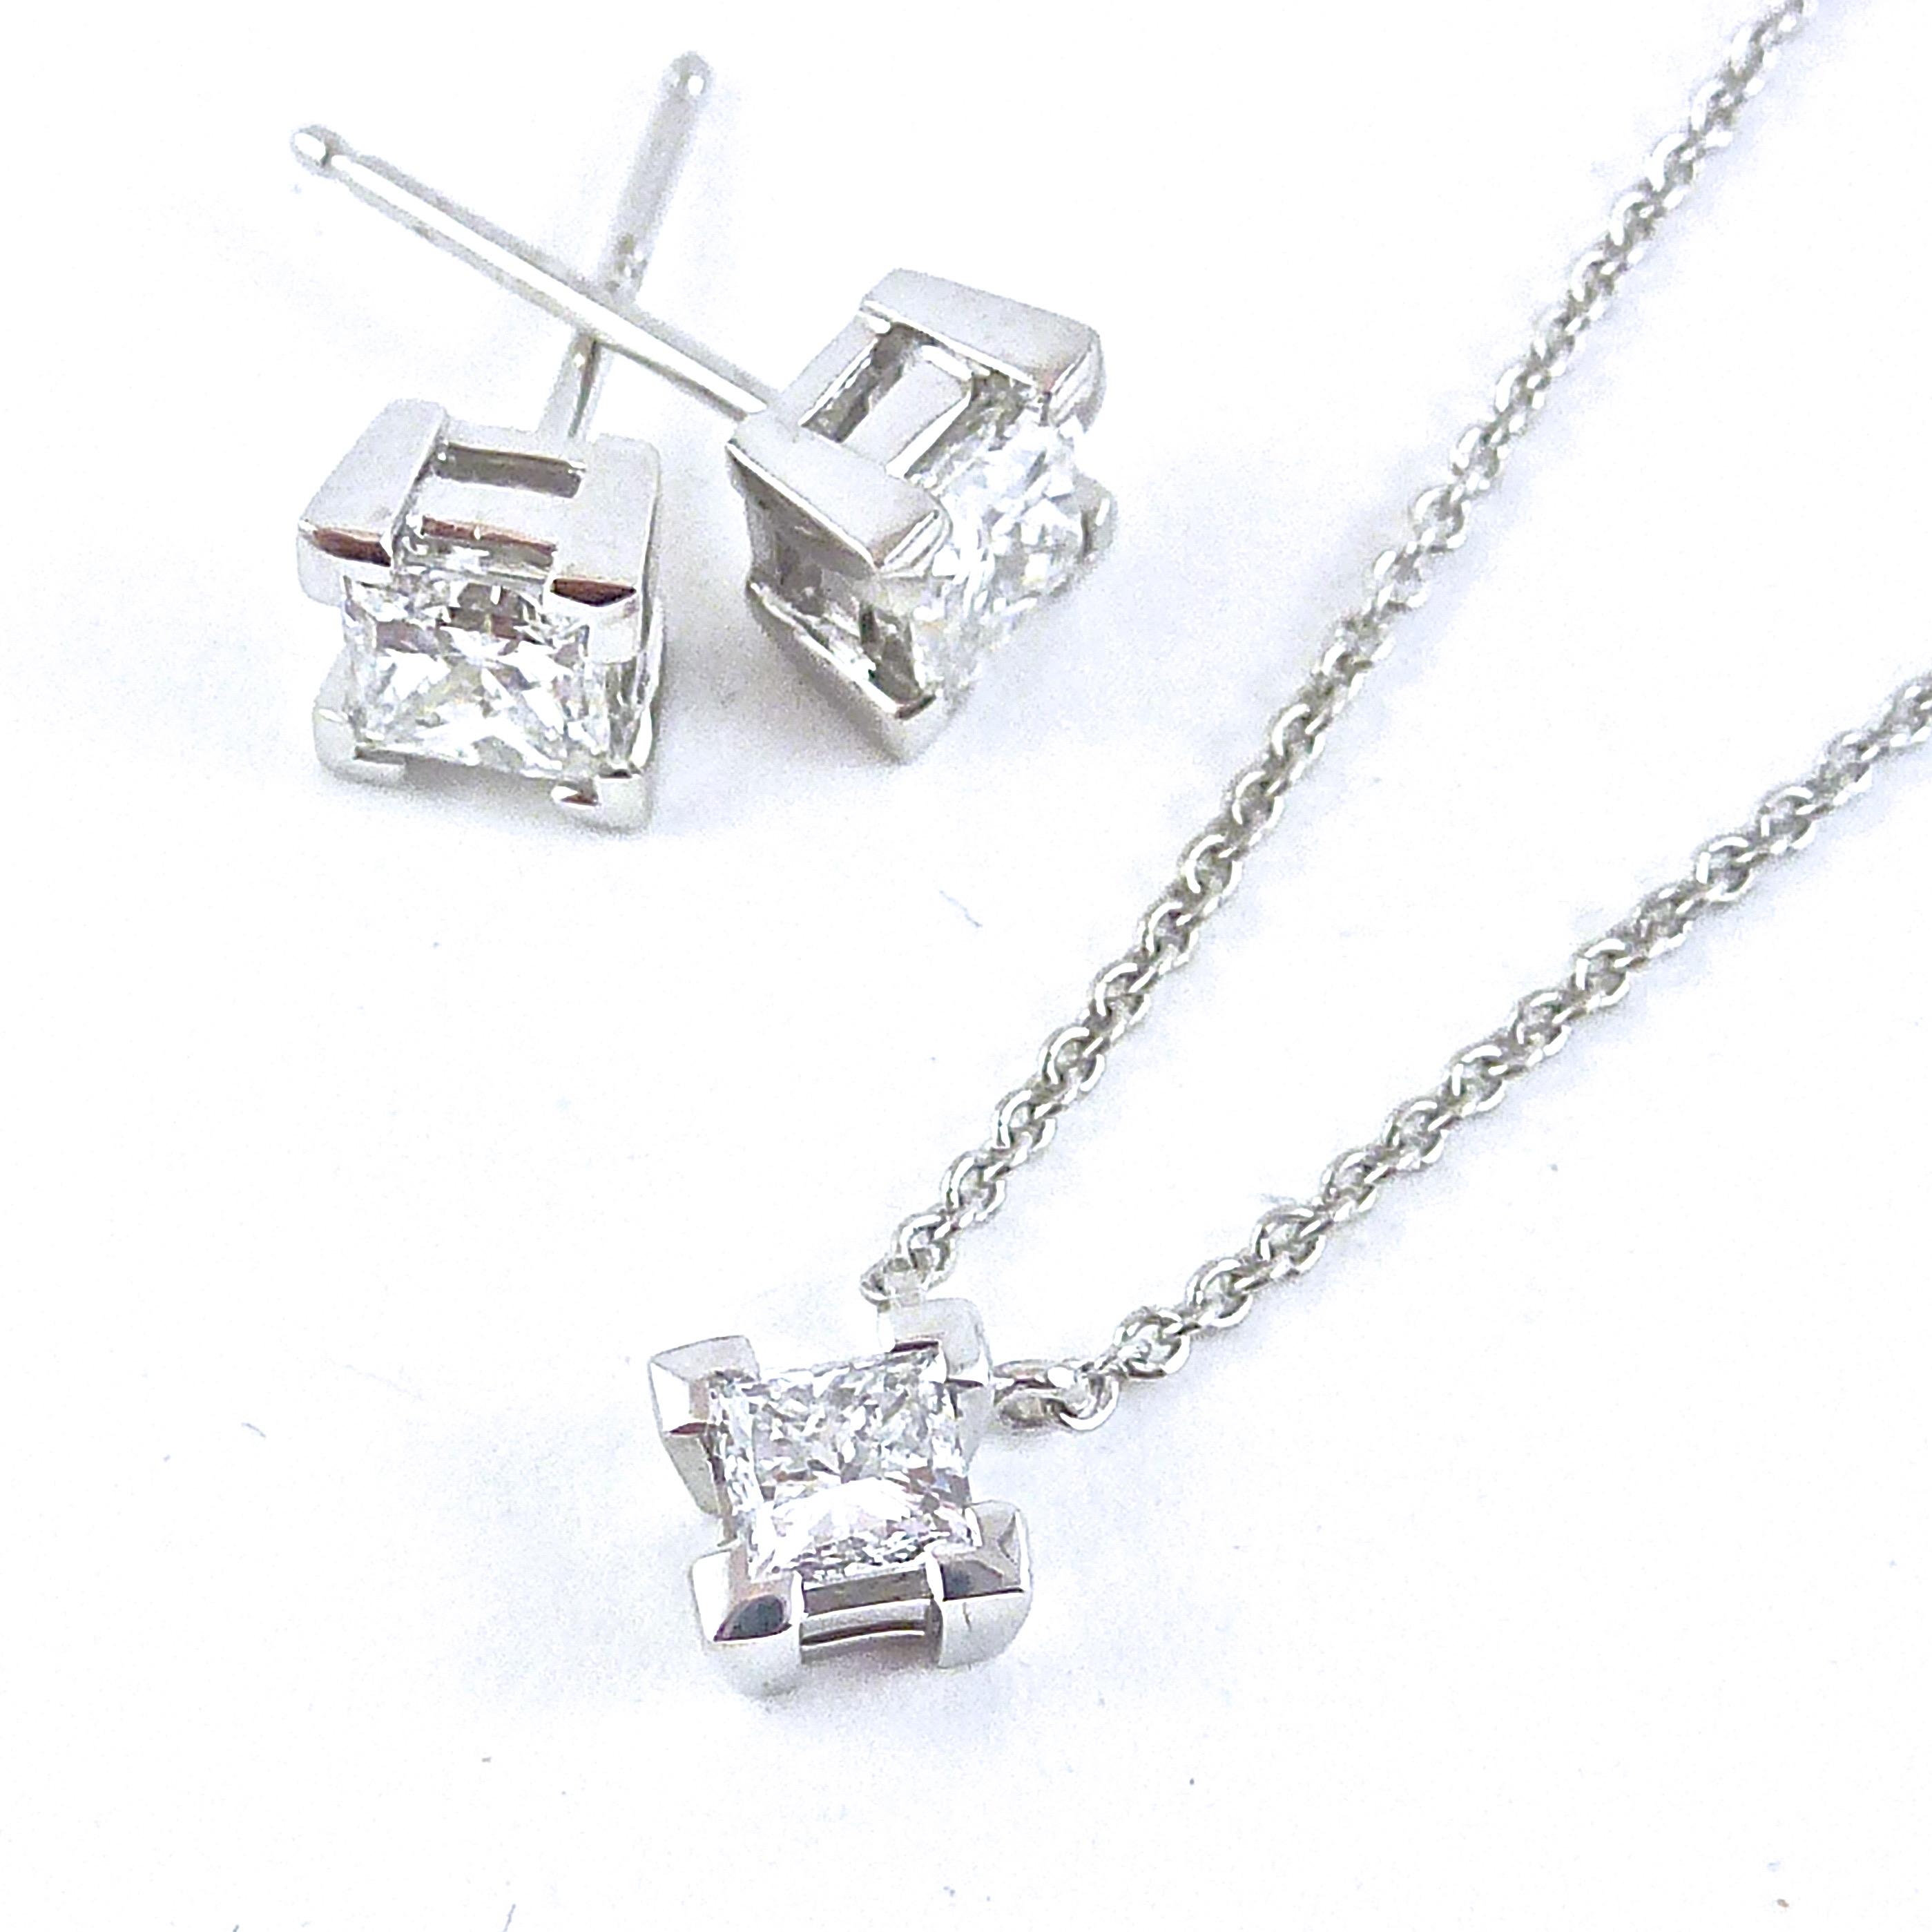 Princess cut diamond corner claw stud earrings and pendant